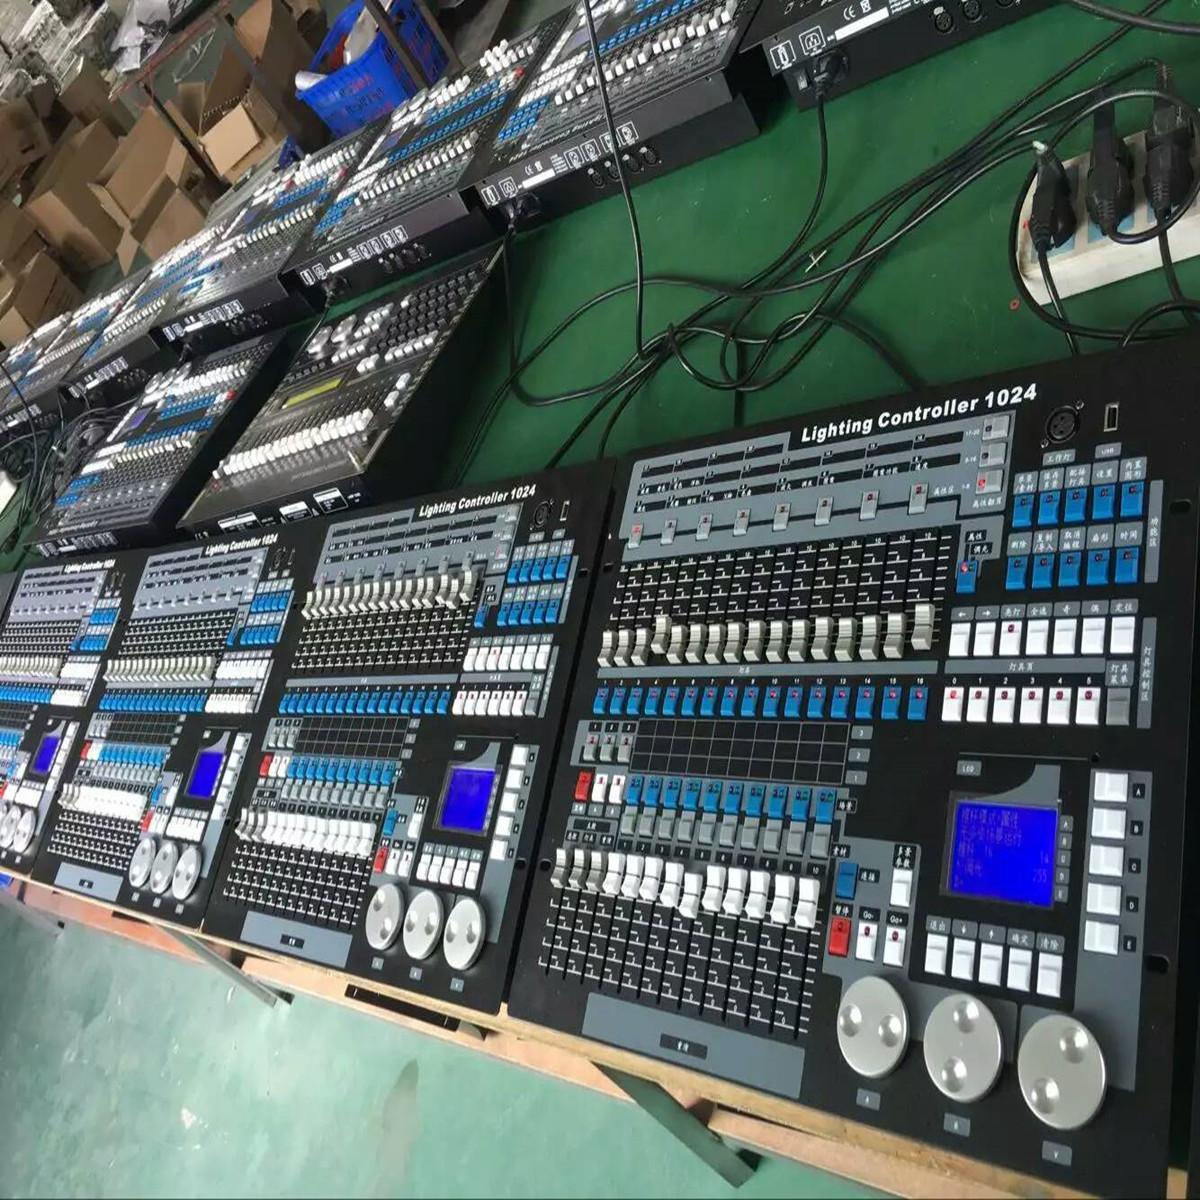 With Flight Case Kingkong 1024 Console Stage Lights DMX Controller DJ Controller DJ Equipment